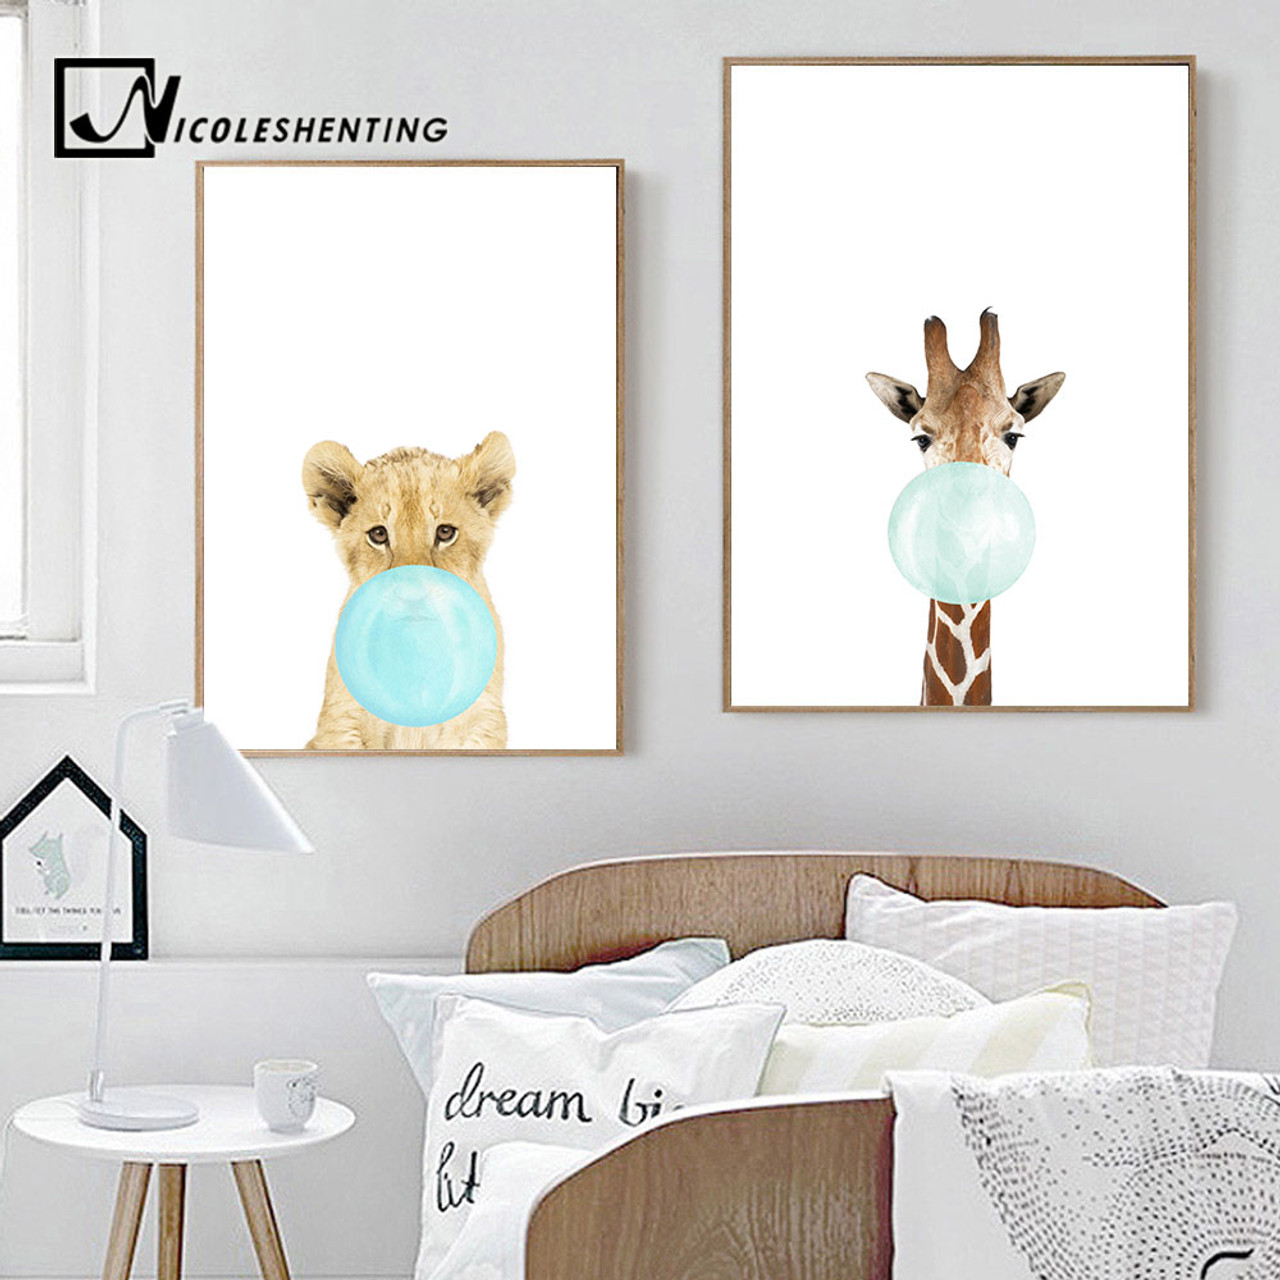 ... NICOLESHENTING Baby Animal Zebra Girafe Canvas Poster Nursery Wall Art  Print Painting Nordic Picture Children Bedroom ...